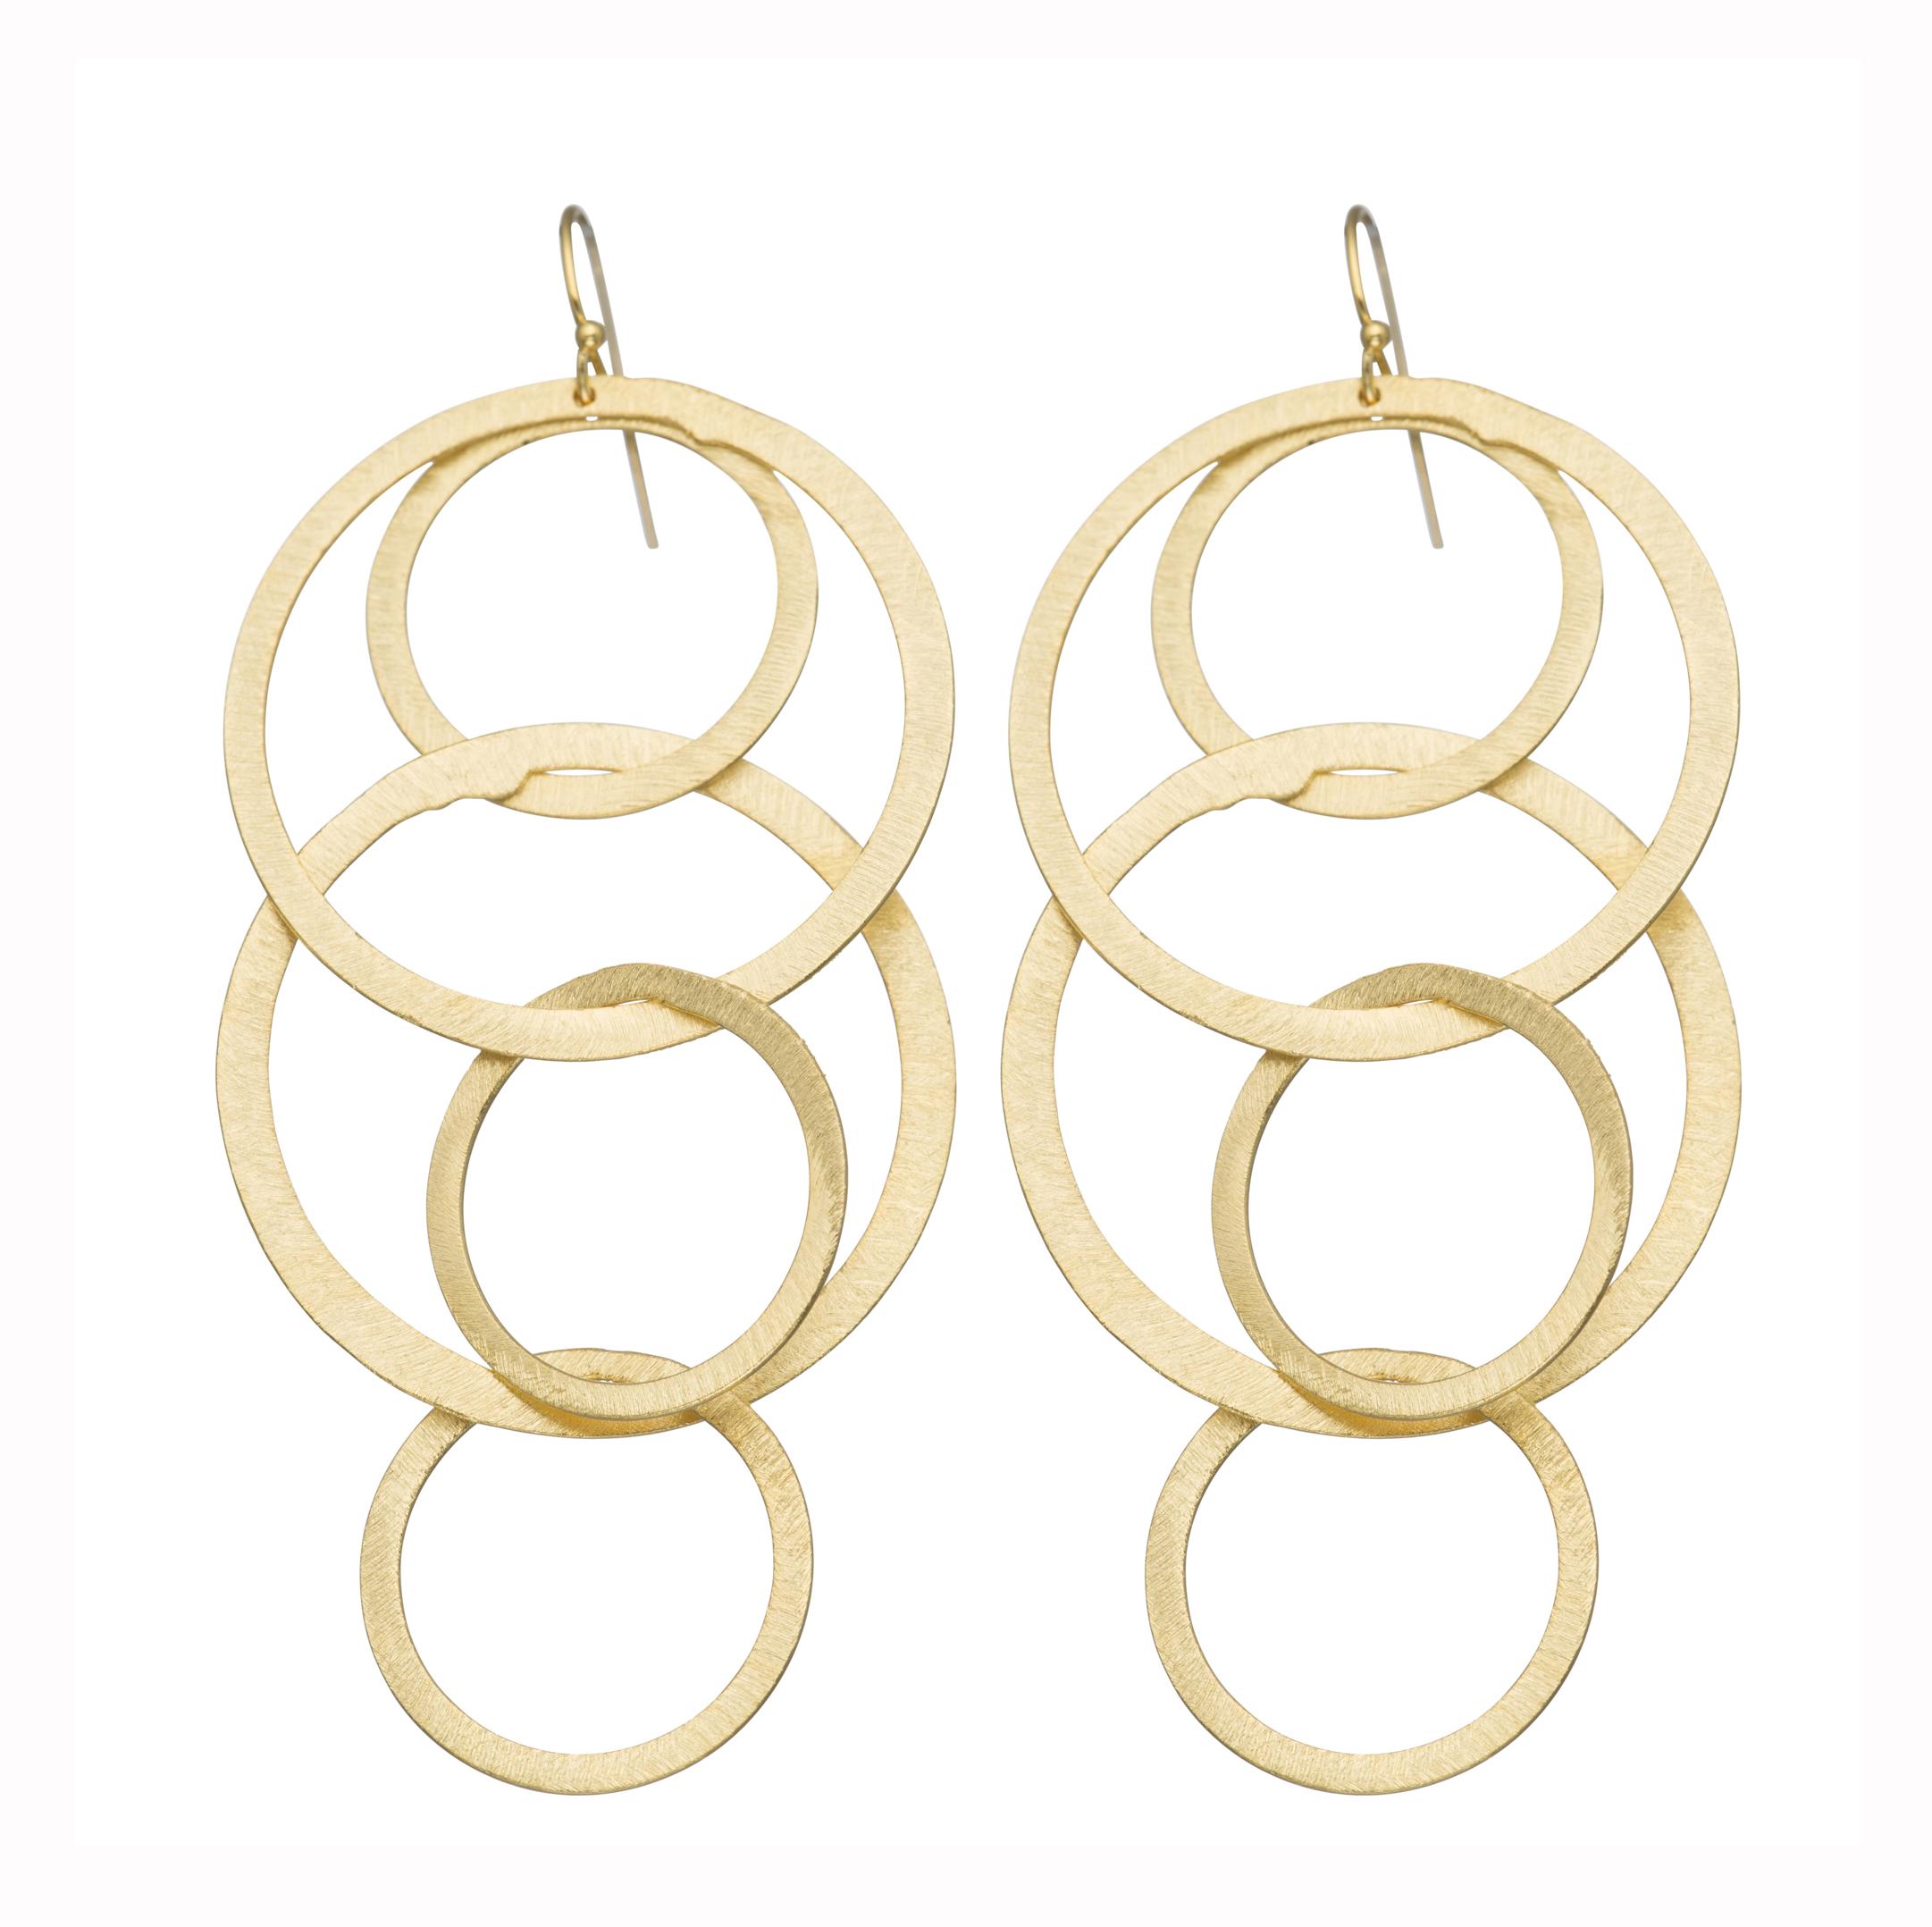 Jumbo Circle Washer Earrings Morra Designs